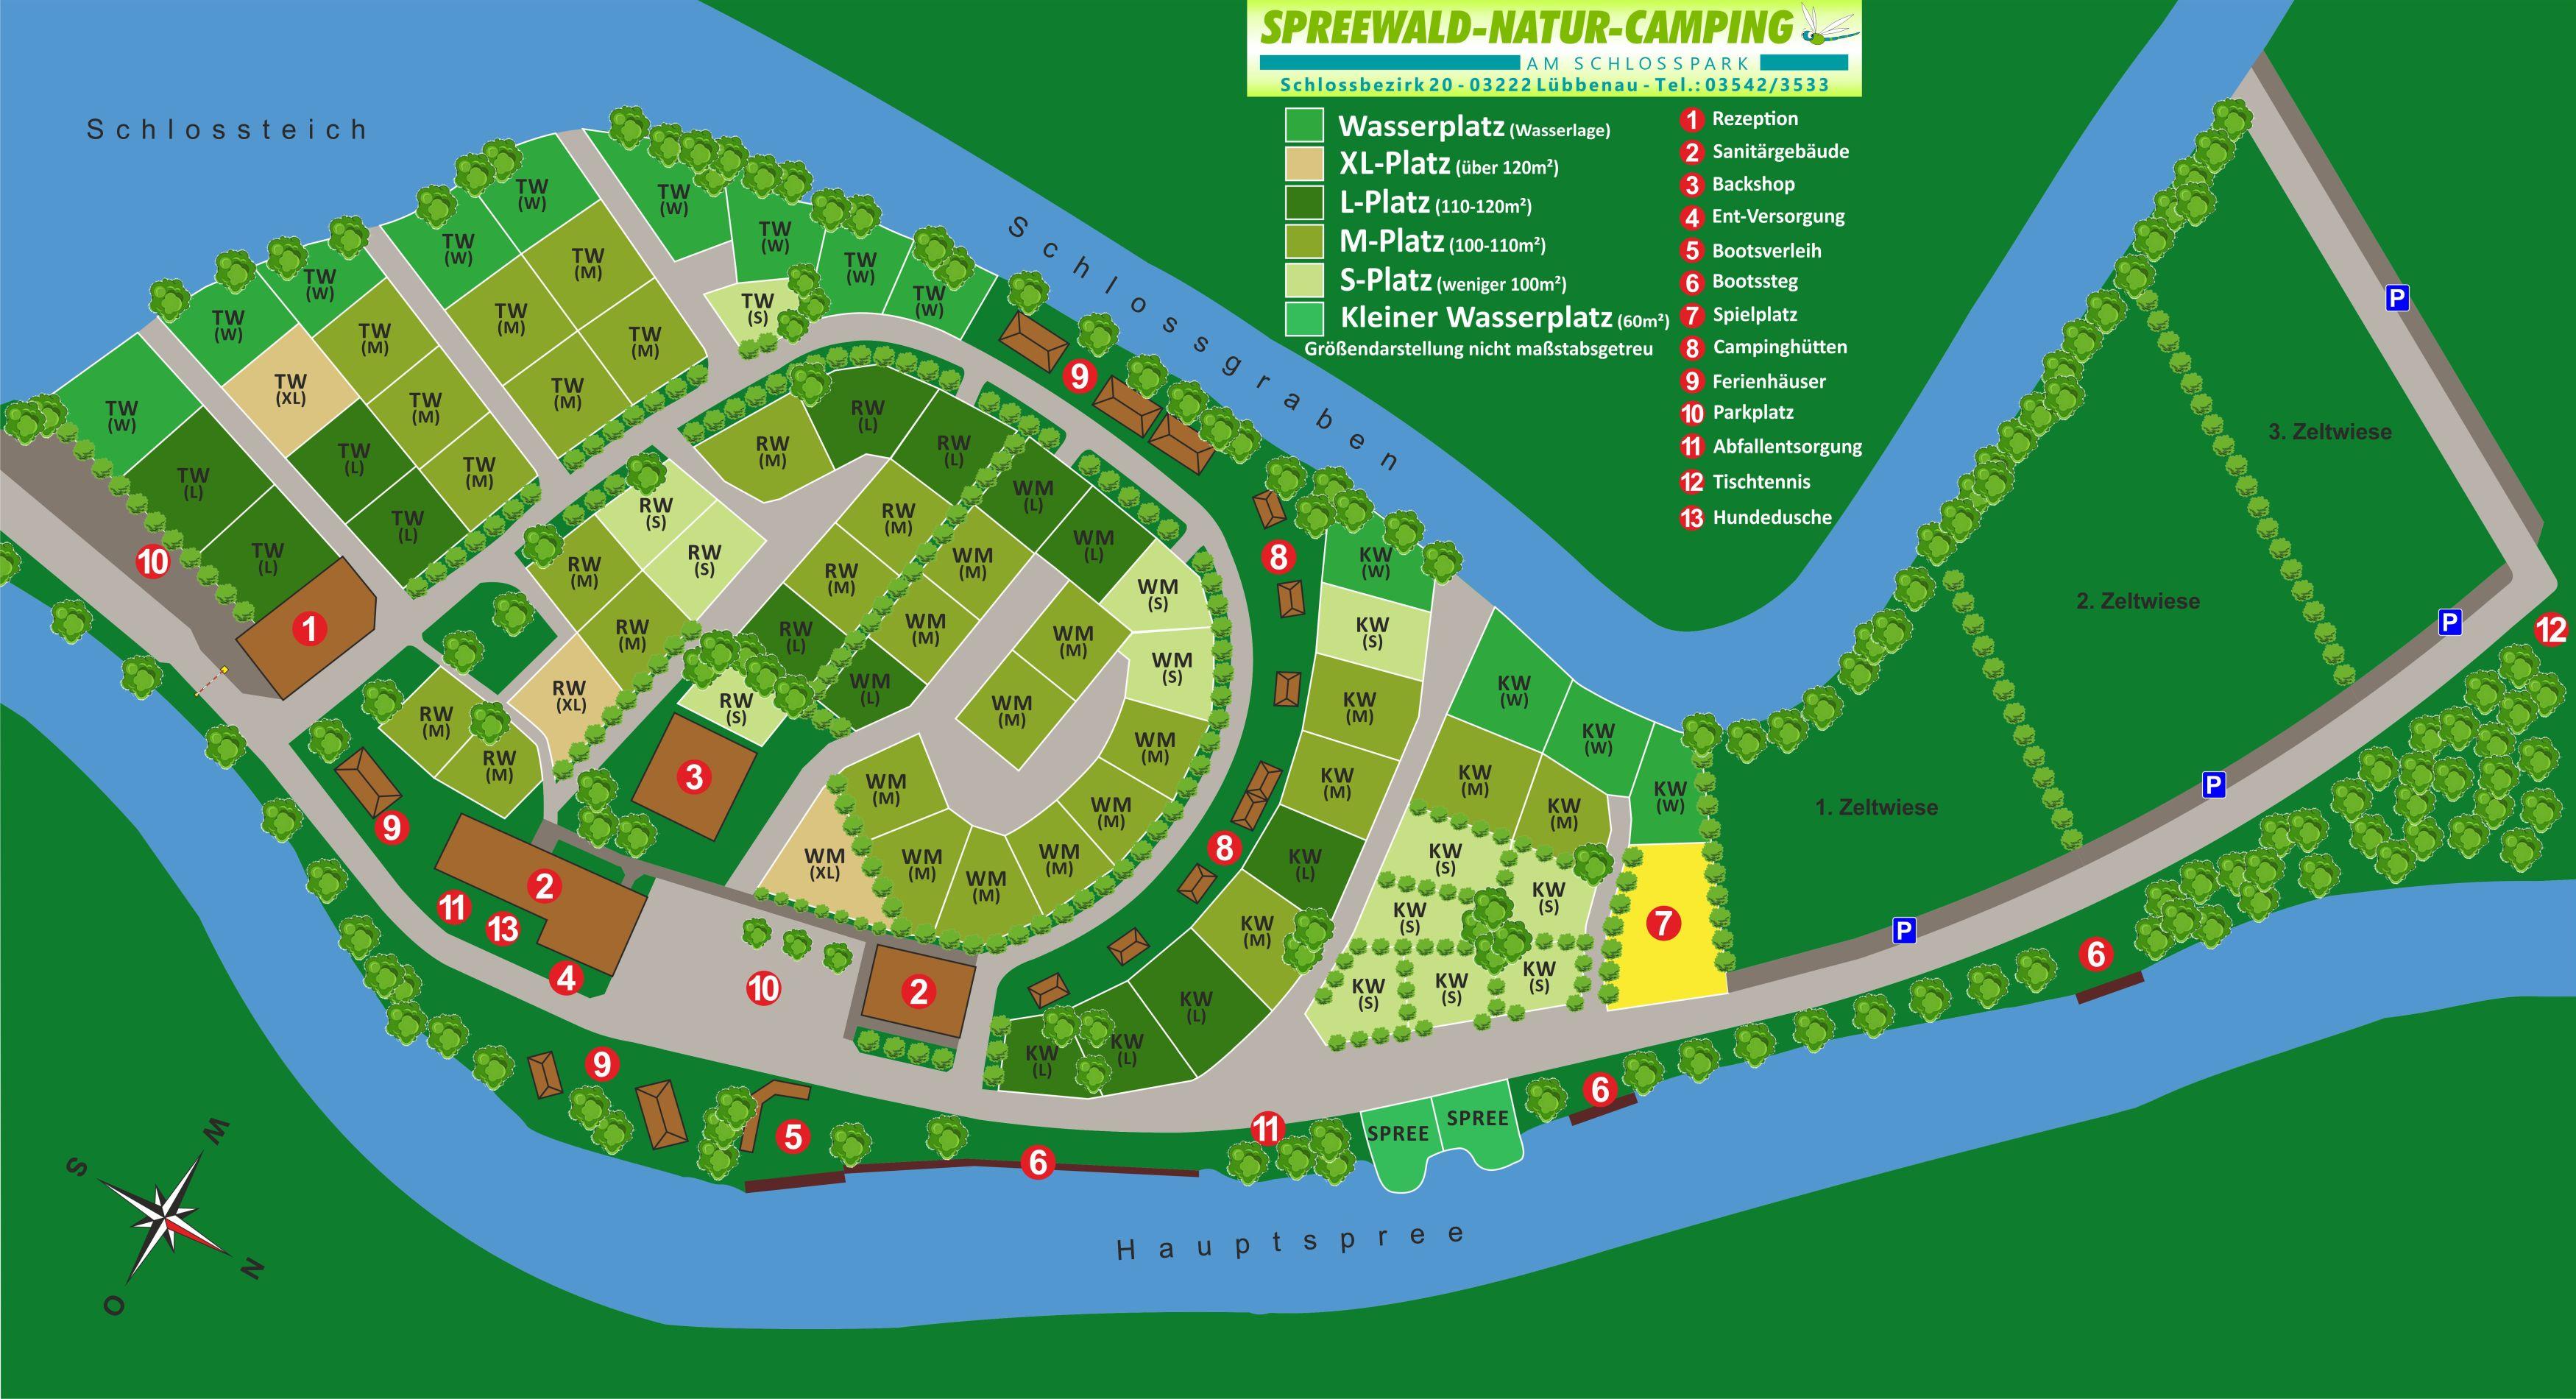 Parzellenplan mit Zeltwiesenn